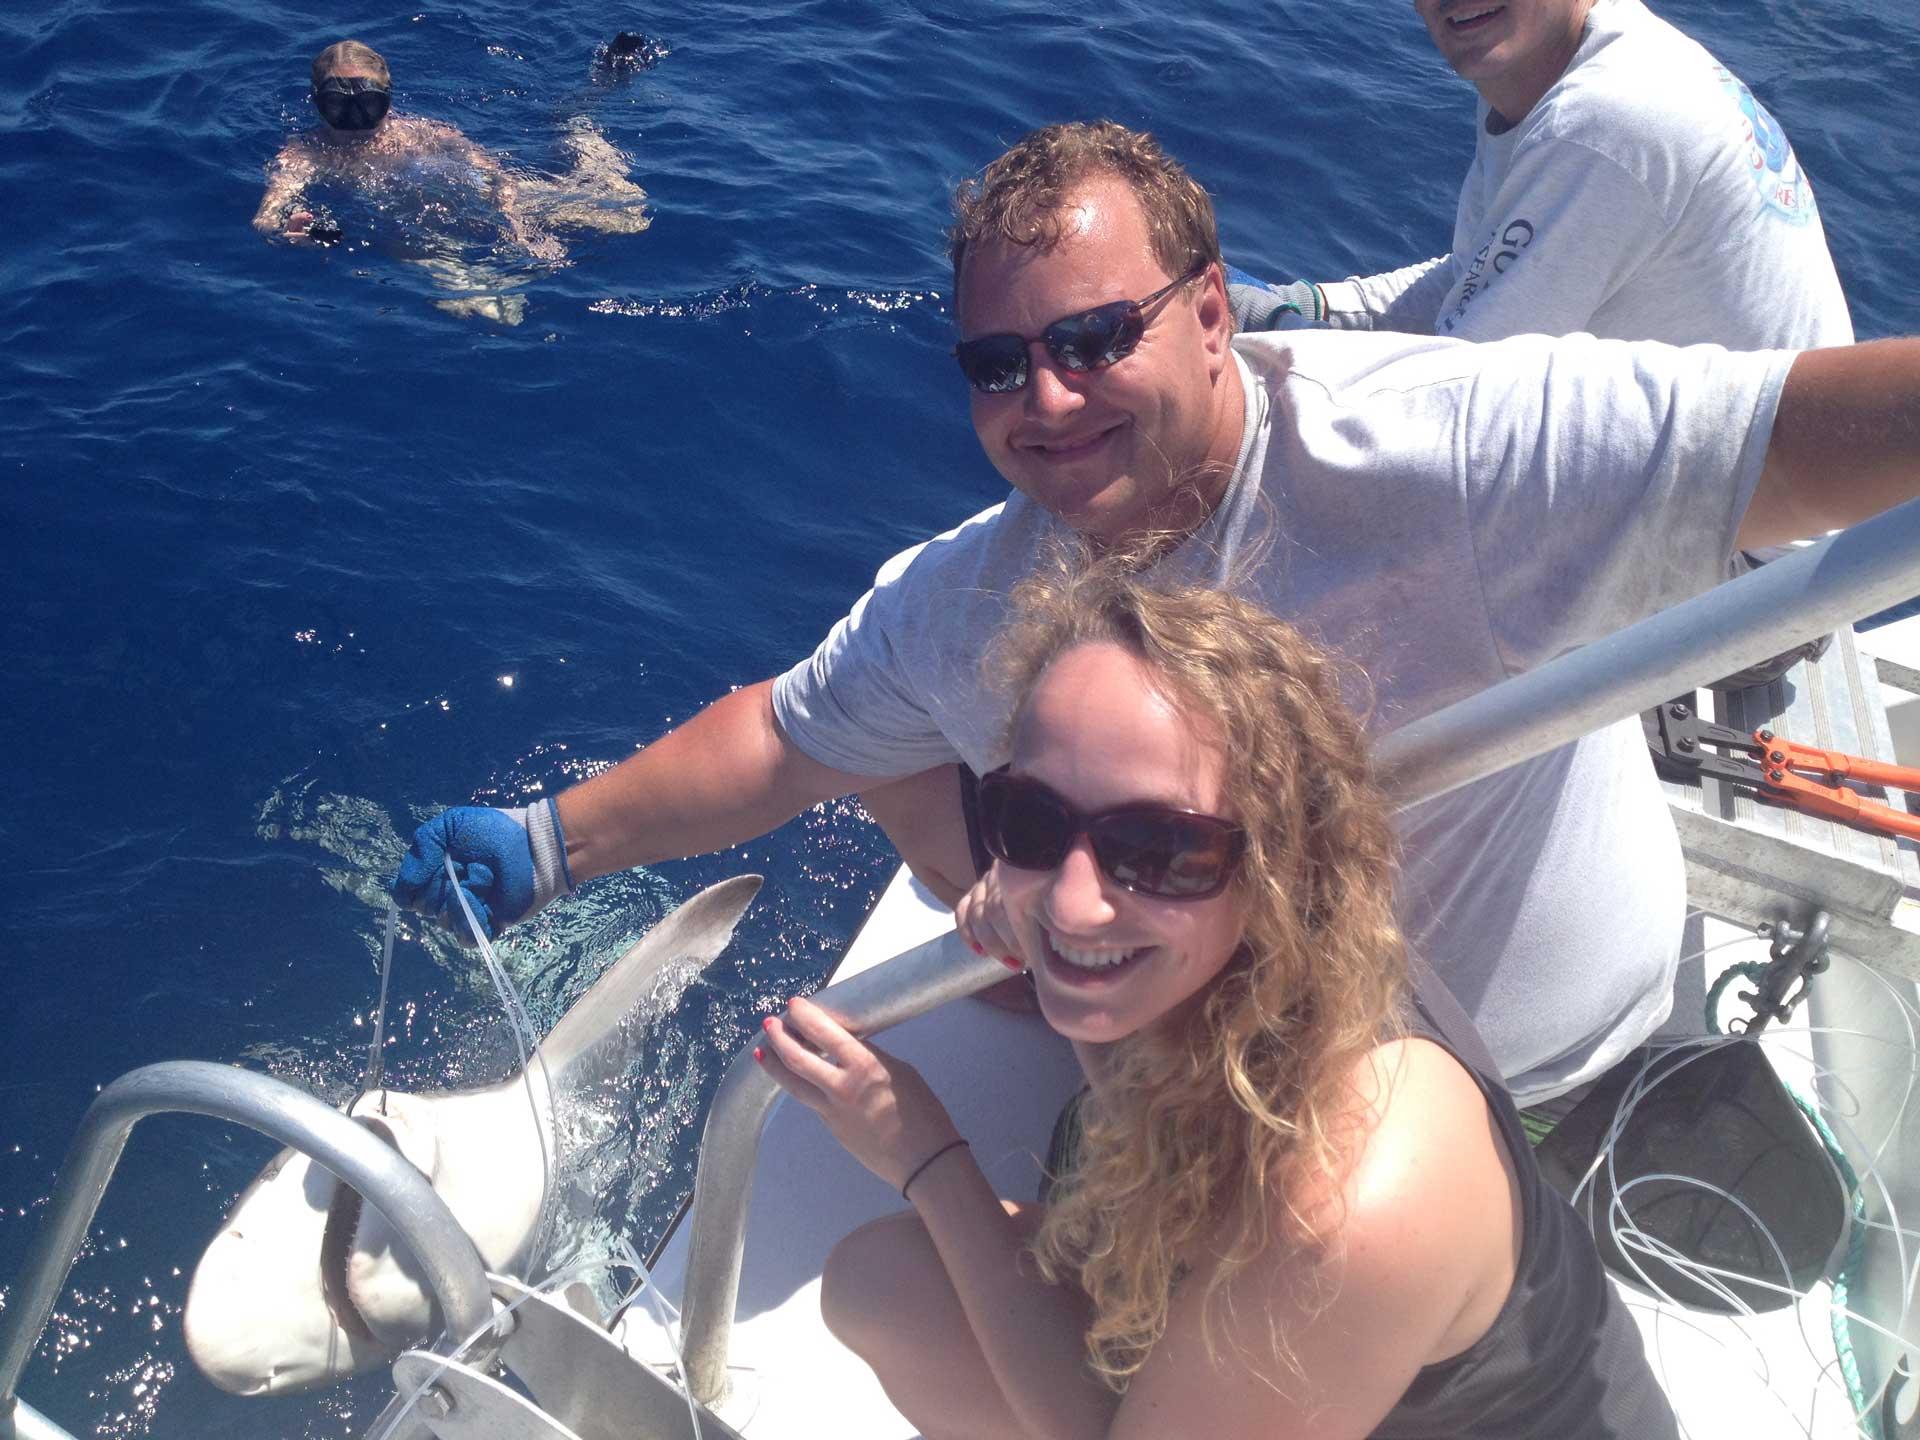 RUCKcassandra - behind the fins